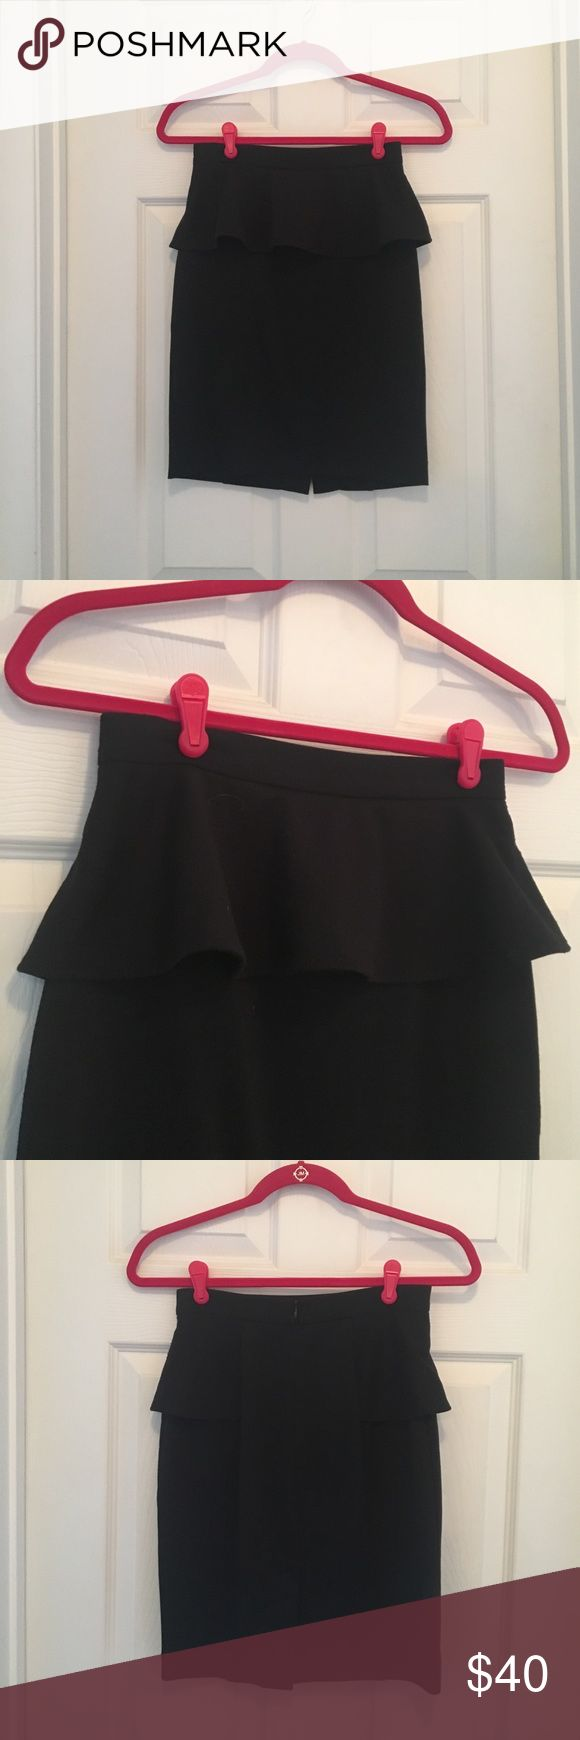 Club Monaco Black Peplum skirt Peplum Skirt - lightly used, great condition. Club Monaco Skirts